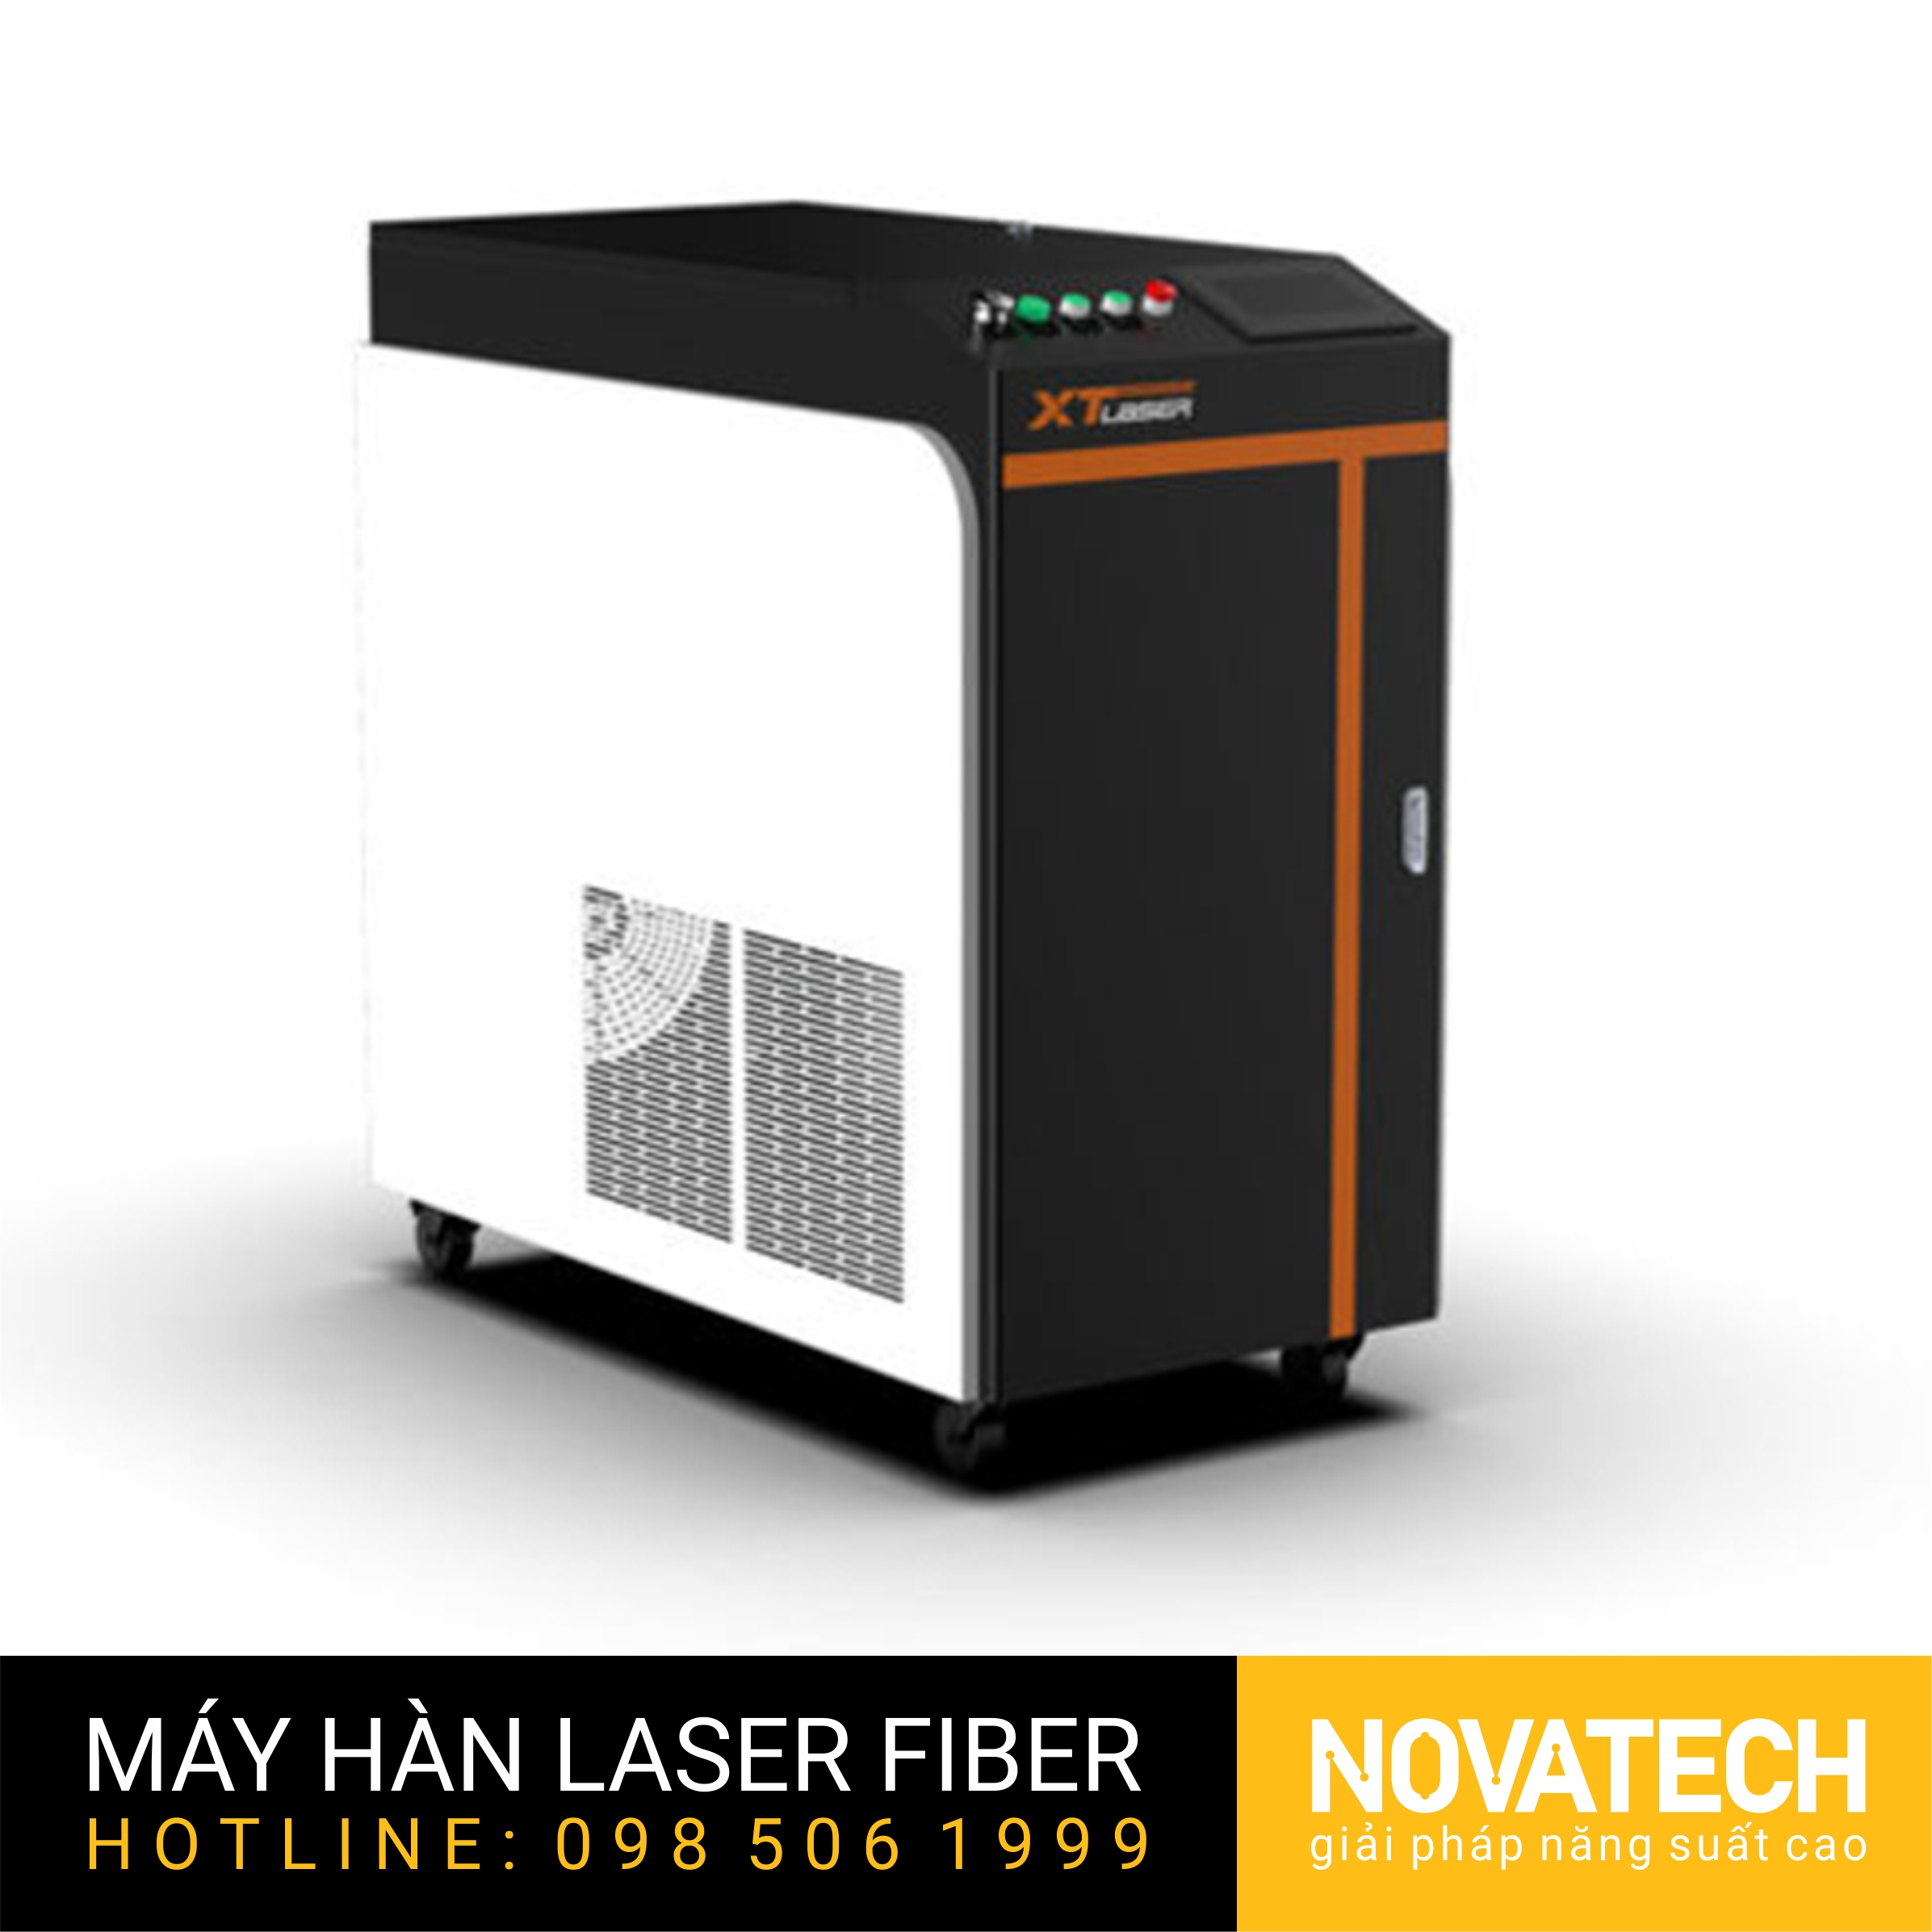 Máy hàn laser cầm tay XT-Laser